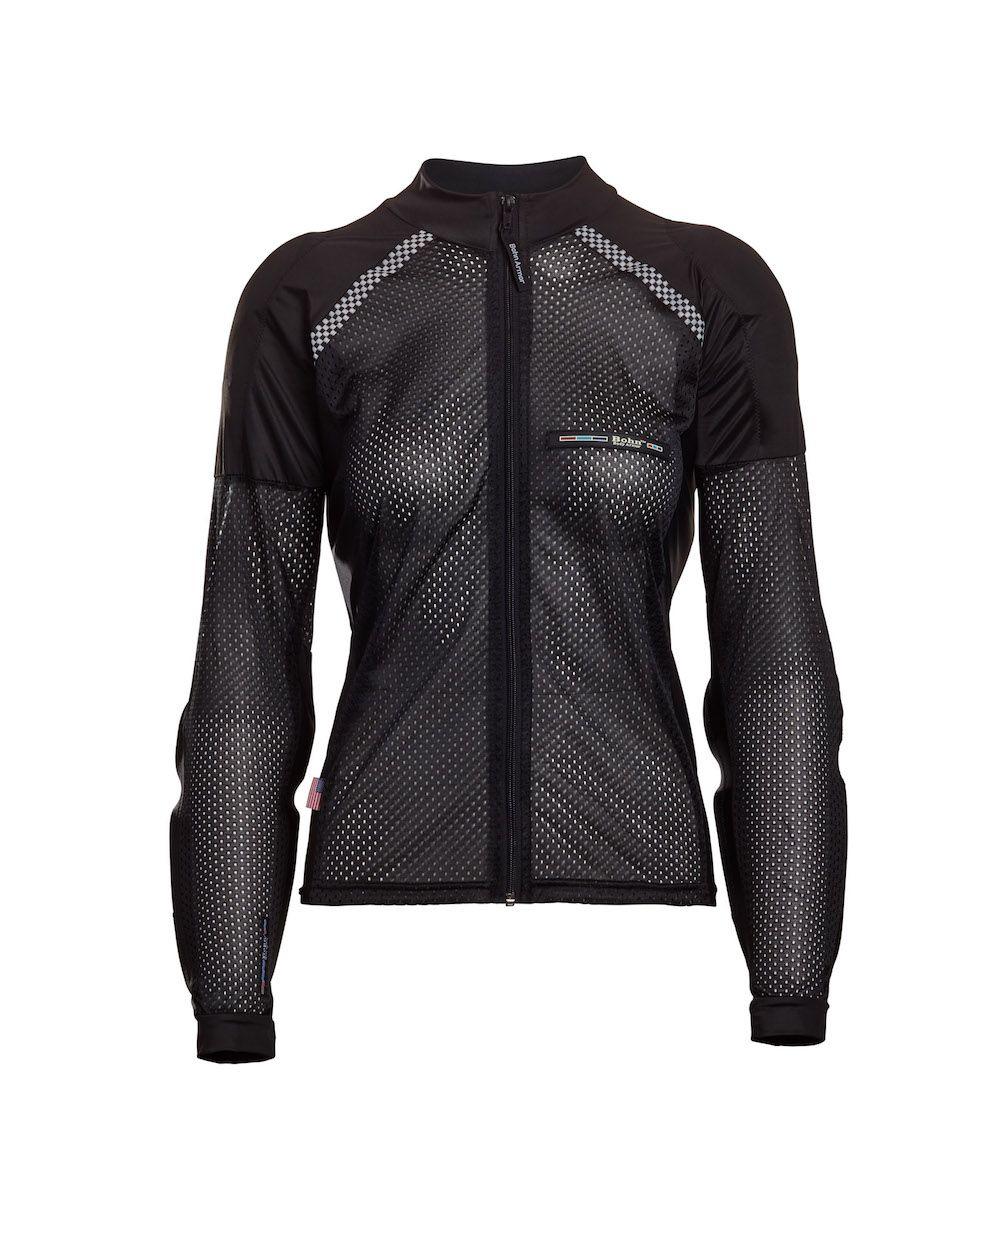 858a42cb9ef All-Season Airtex Armored Riding Shirt - Black | Moto | Shirts ...